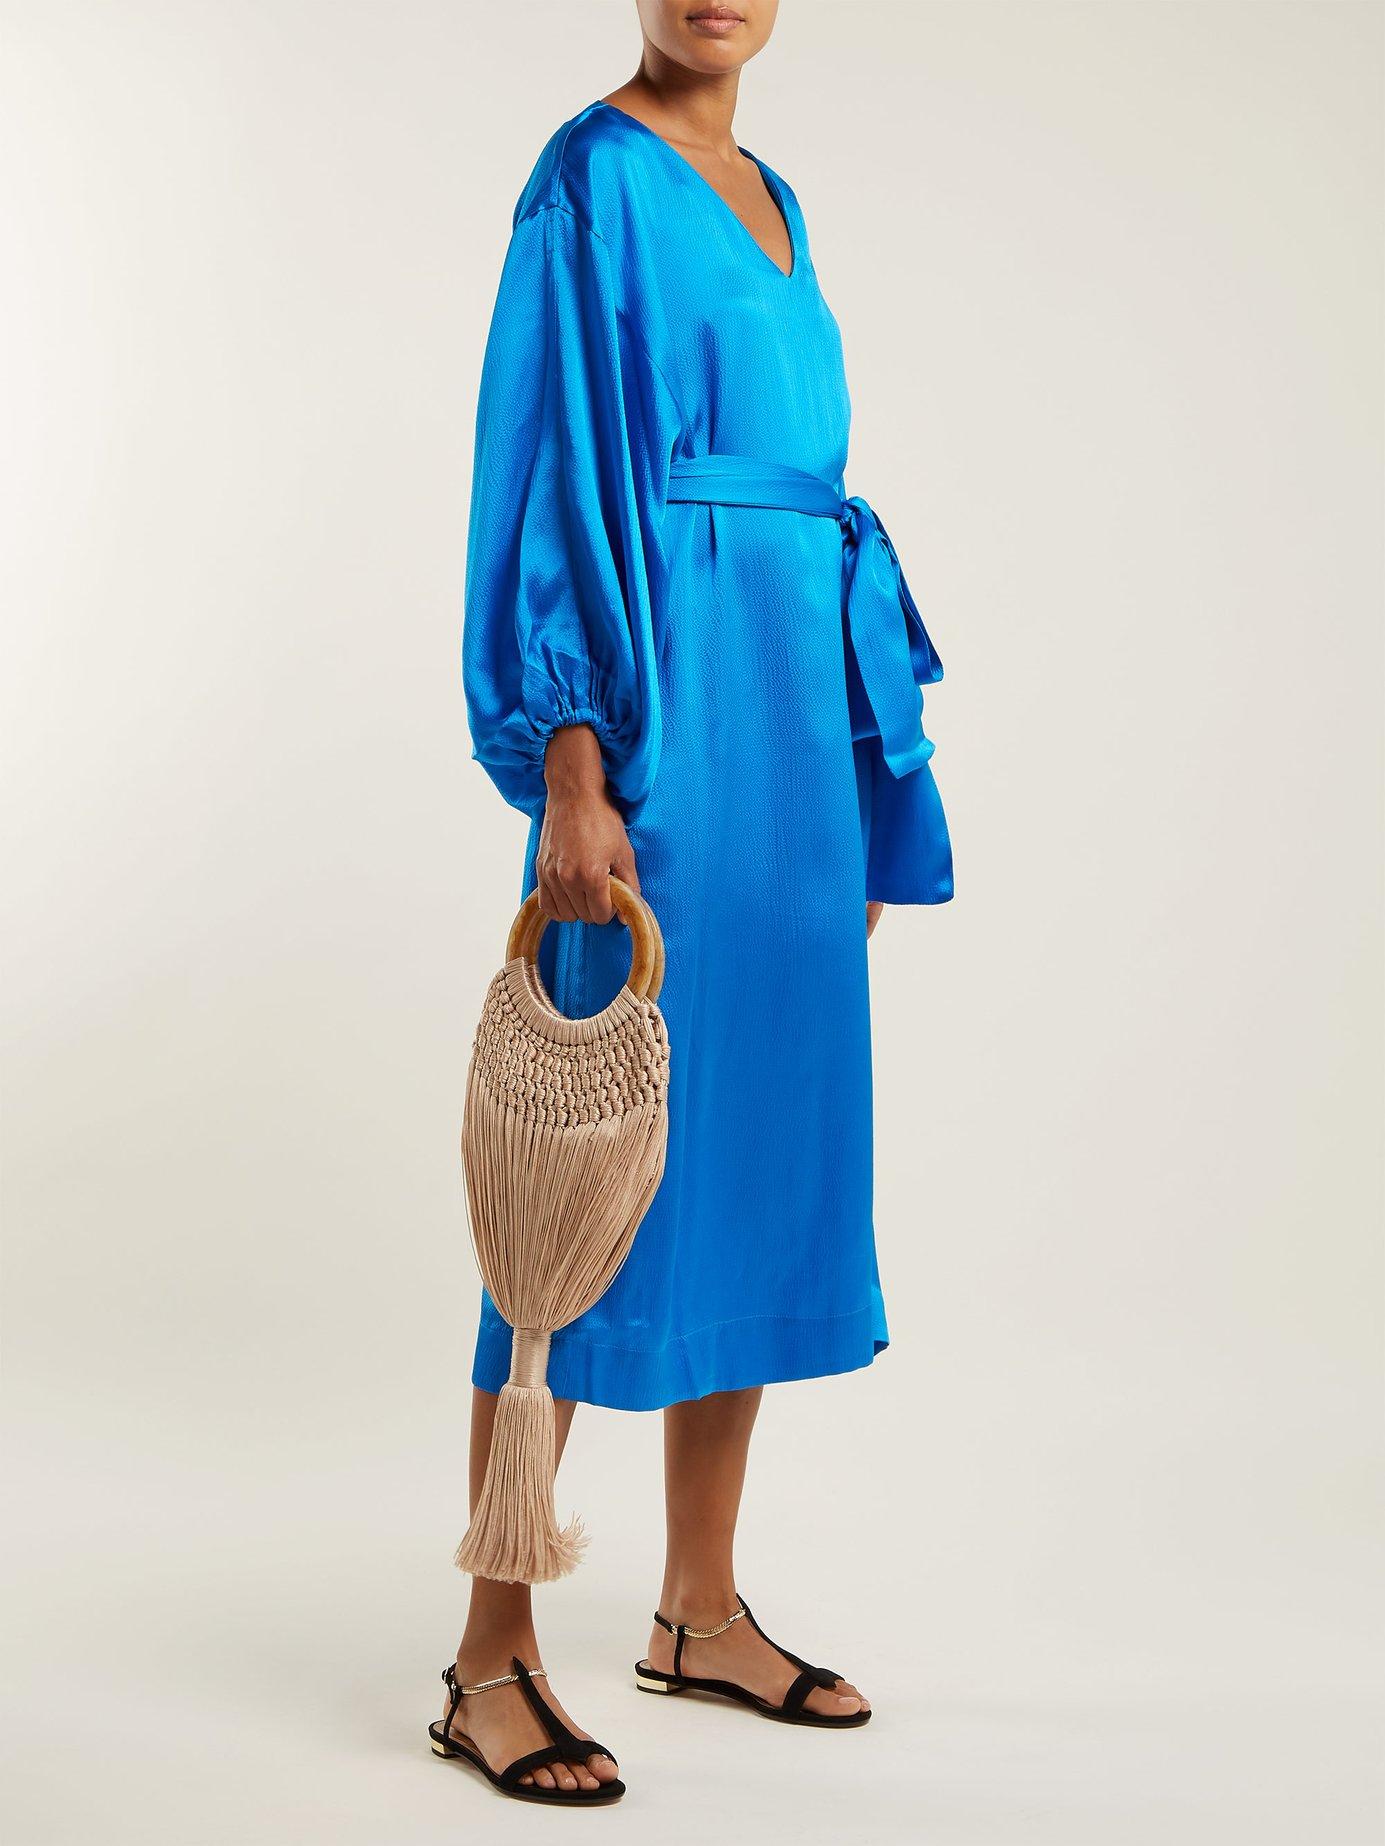 Delilah balloon-sleeved silk dress by Rhode Resort